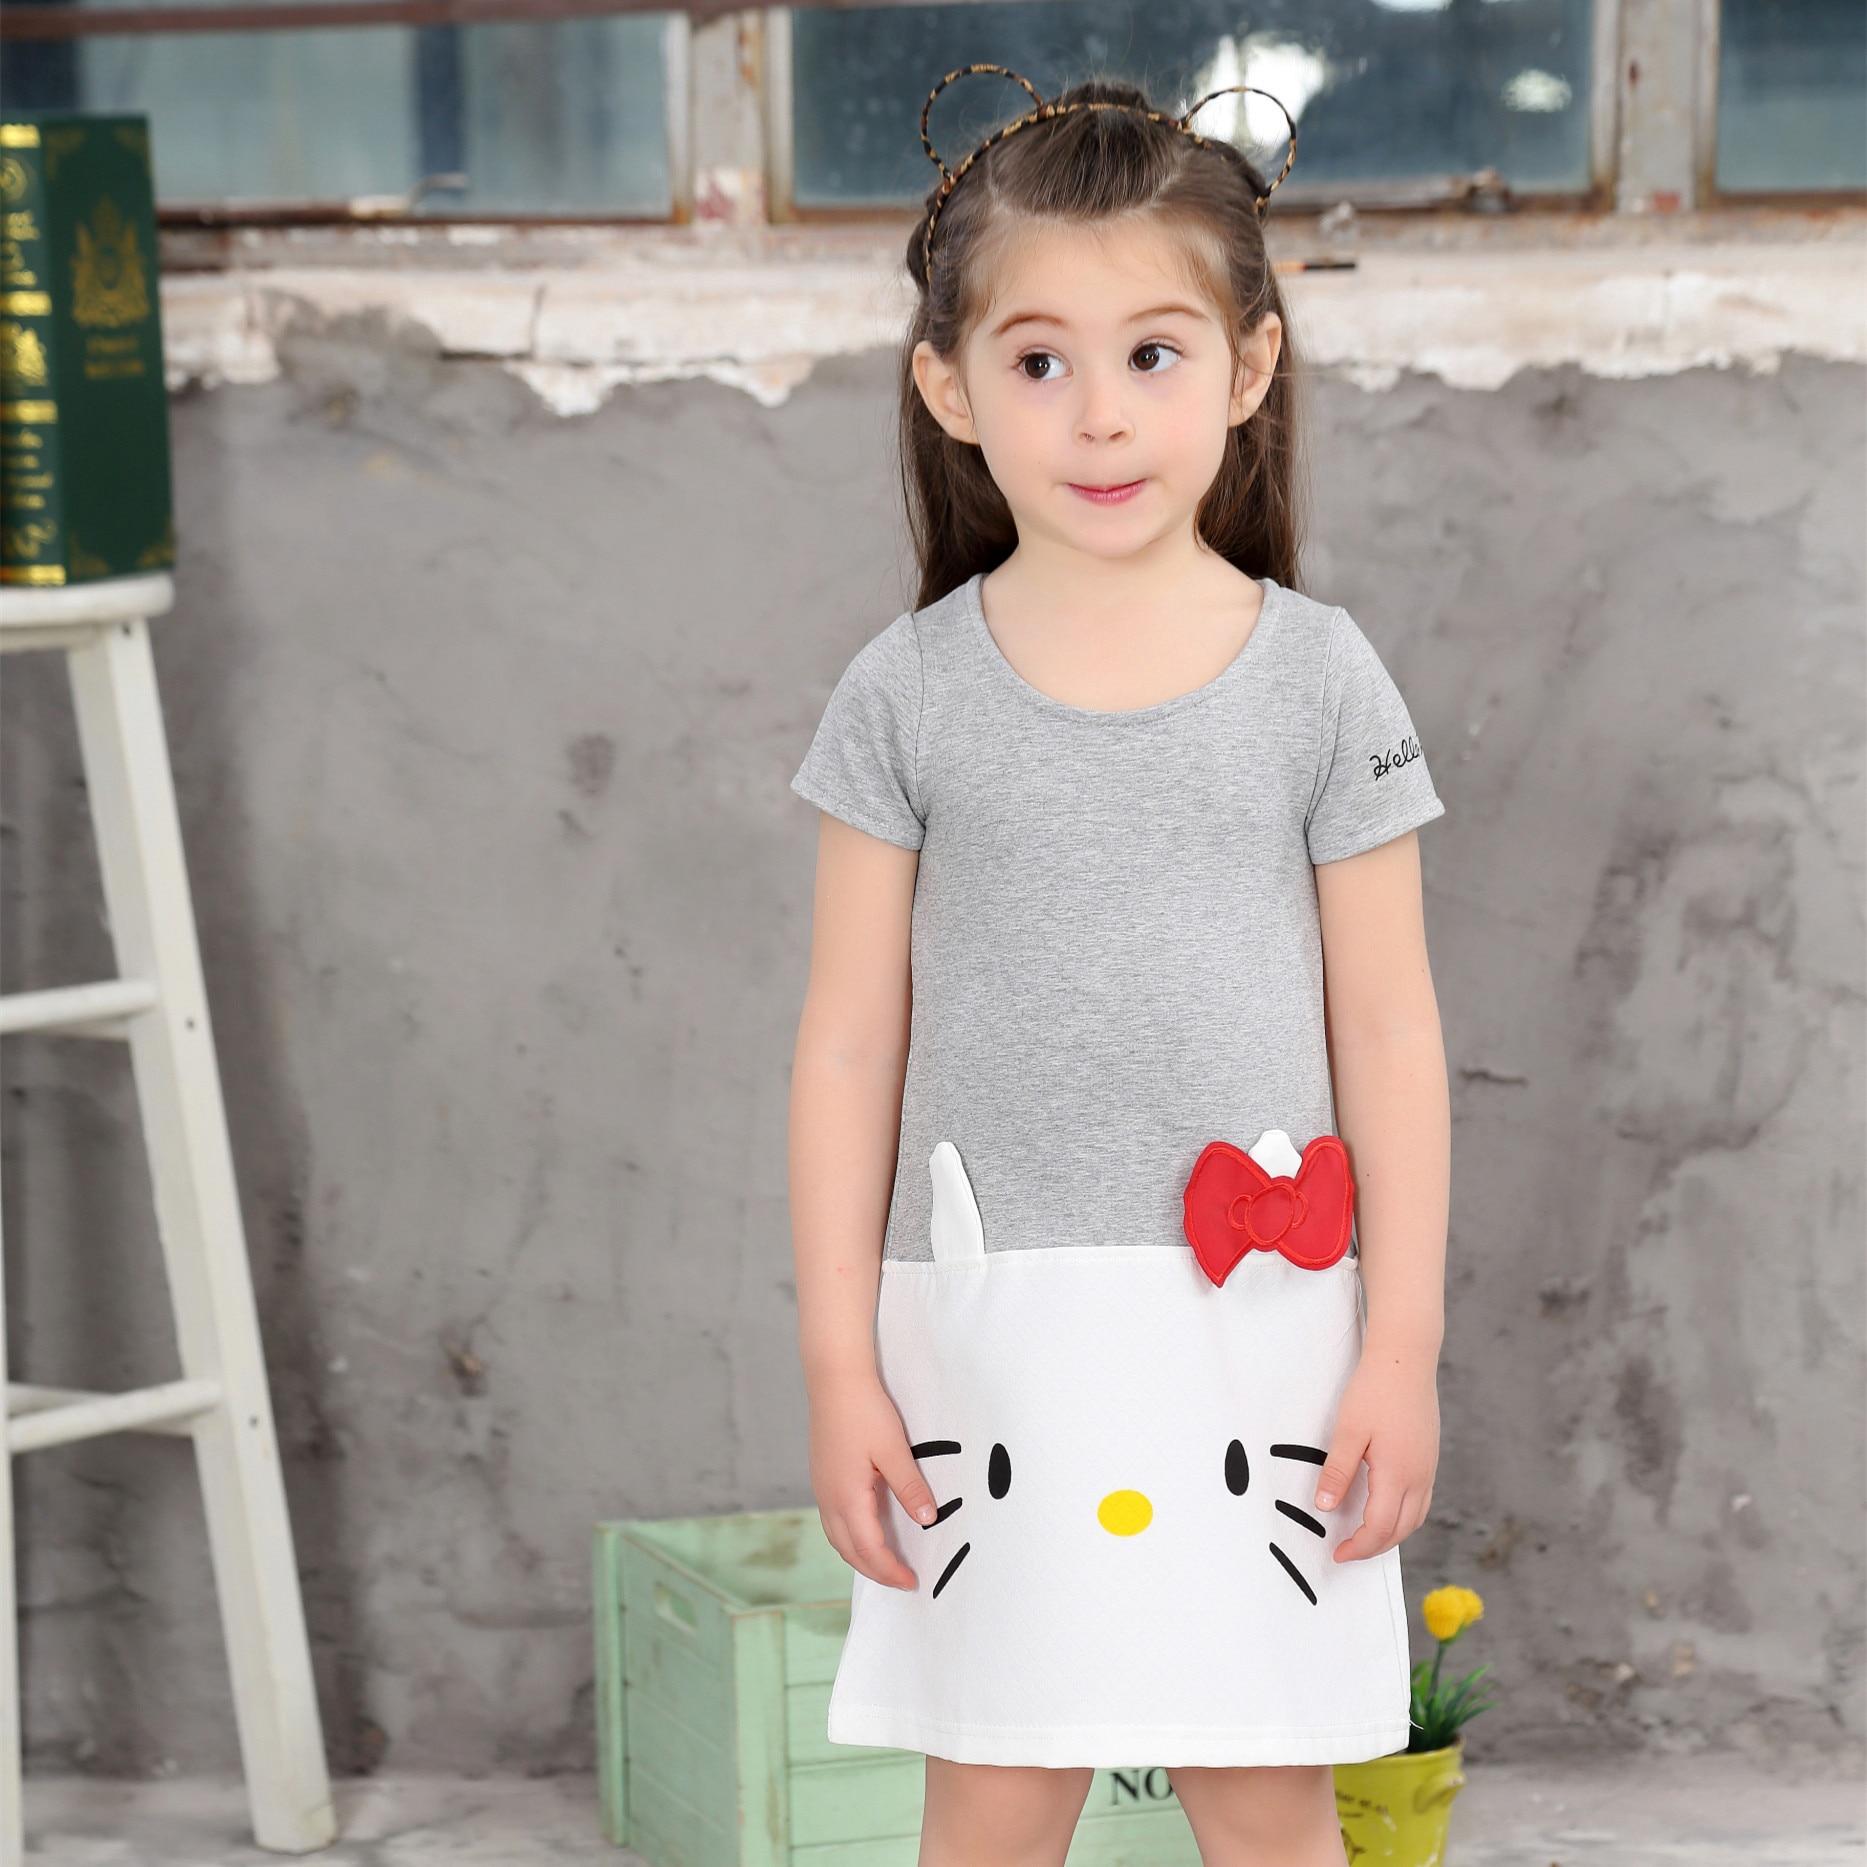 2019 Summer Cute Girls Dress Sweet Cat Animal Print Cartoon Girl Dress Cotton Grey Color Kids Children Cute Short Sleeve Dresses in Dresses from Mother Kids